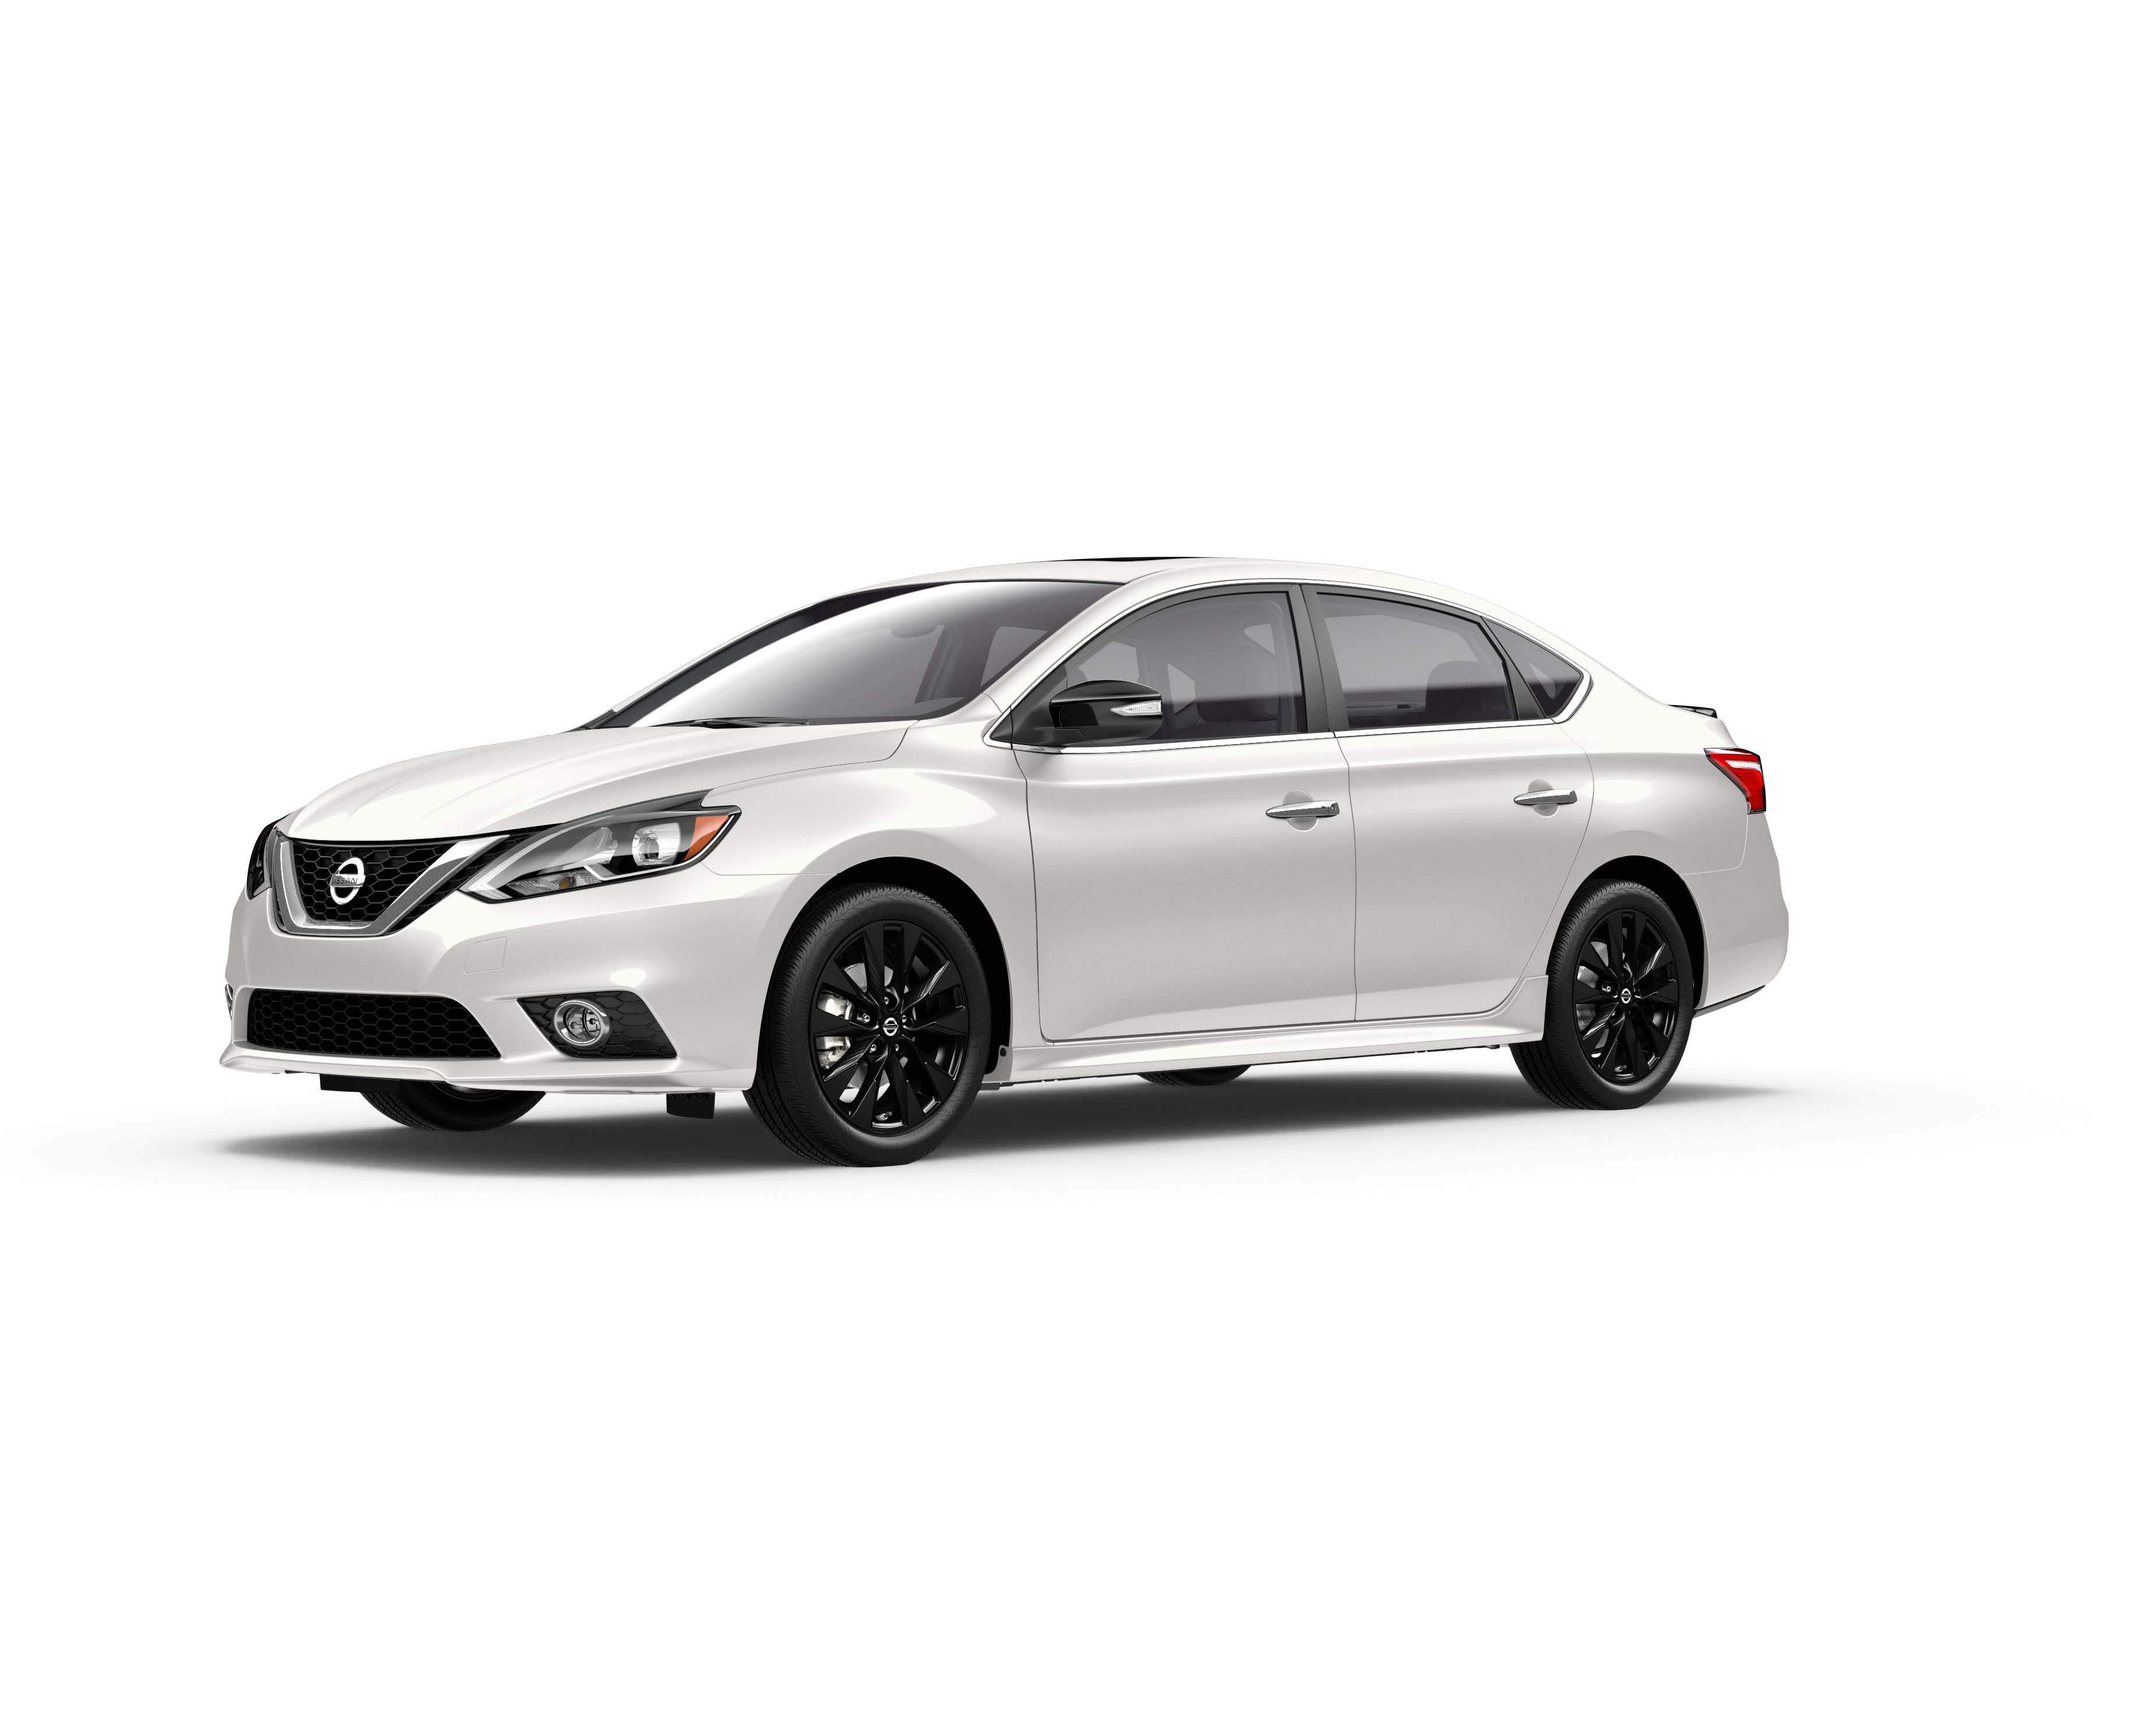 Duluth Minnesota Nissan Dealership Krenzen Spescial Order Parts By Request 2019 Sentra